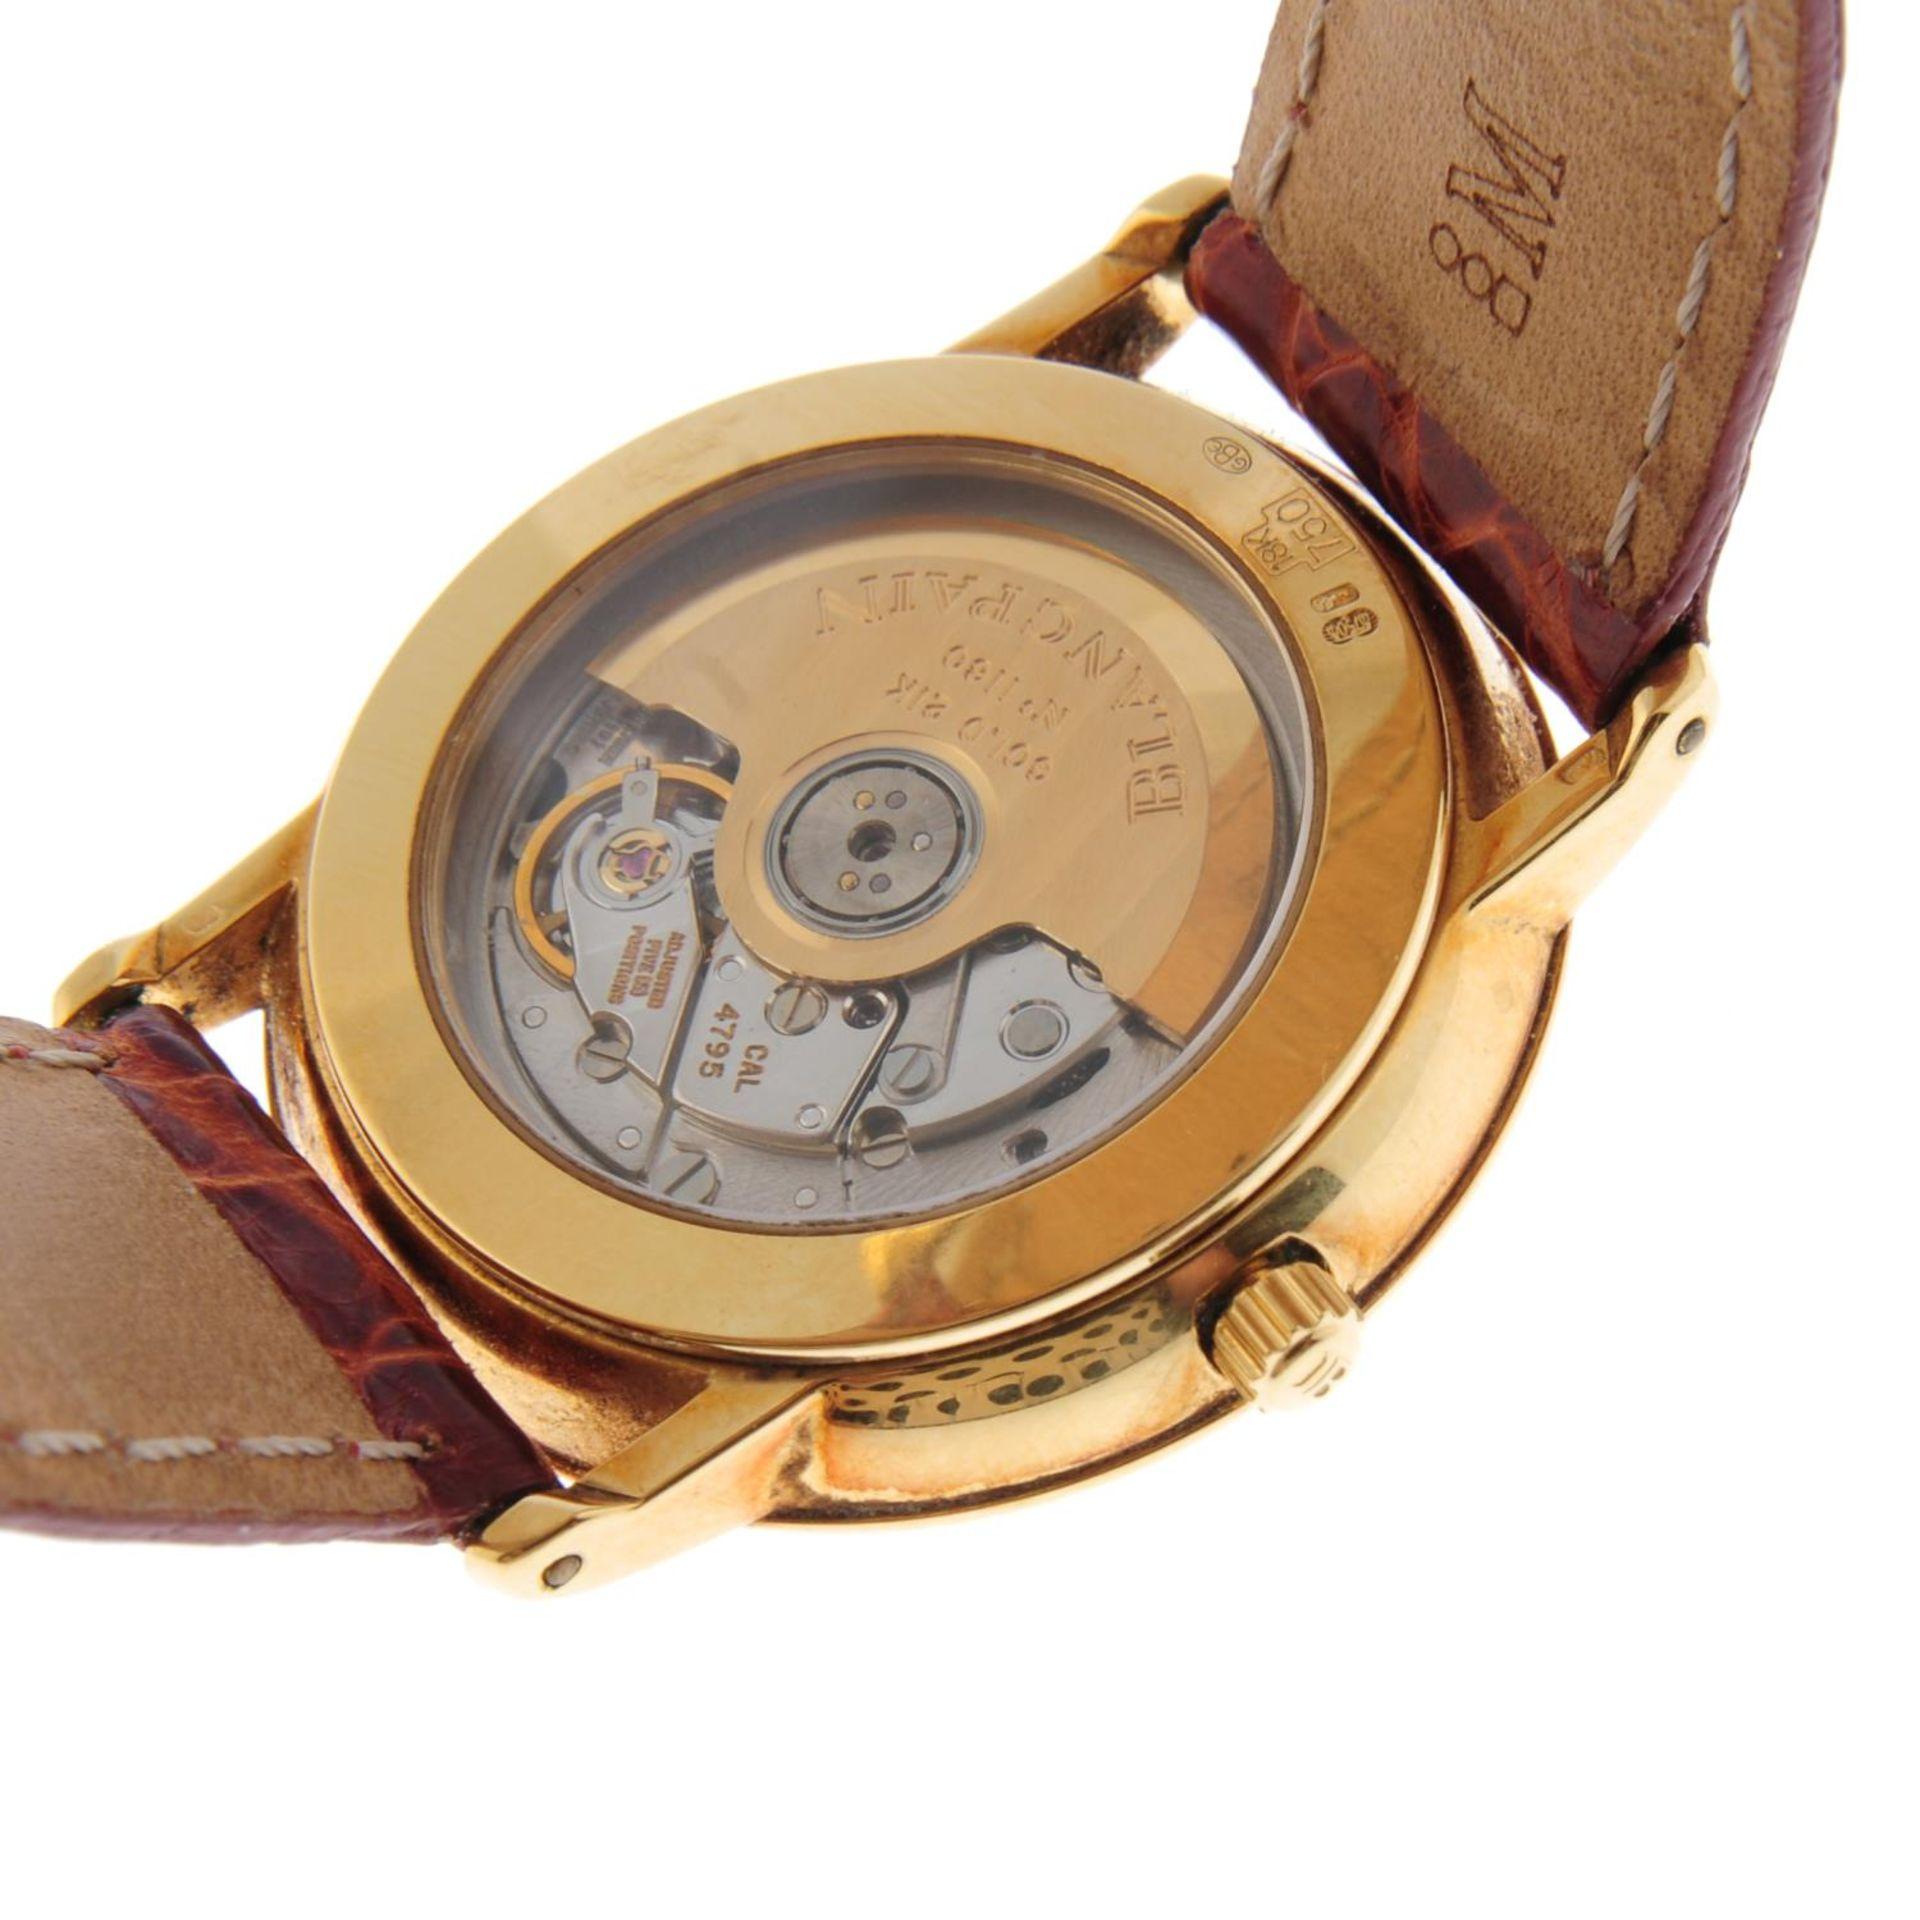 BLANCPAIN - a Villeret wrist watch. - Bild 2 aus 6